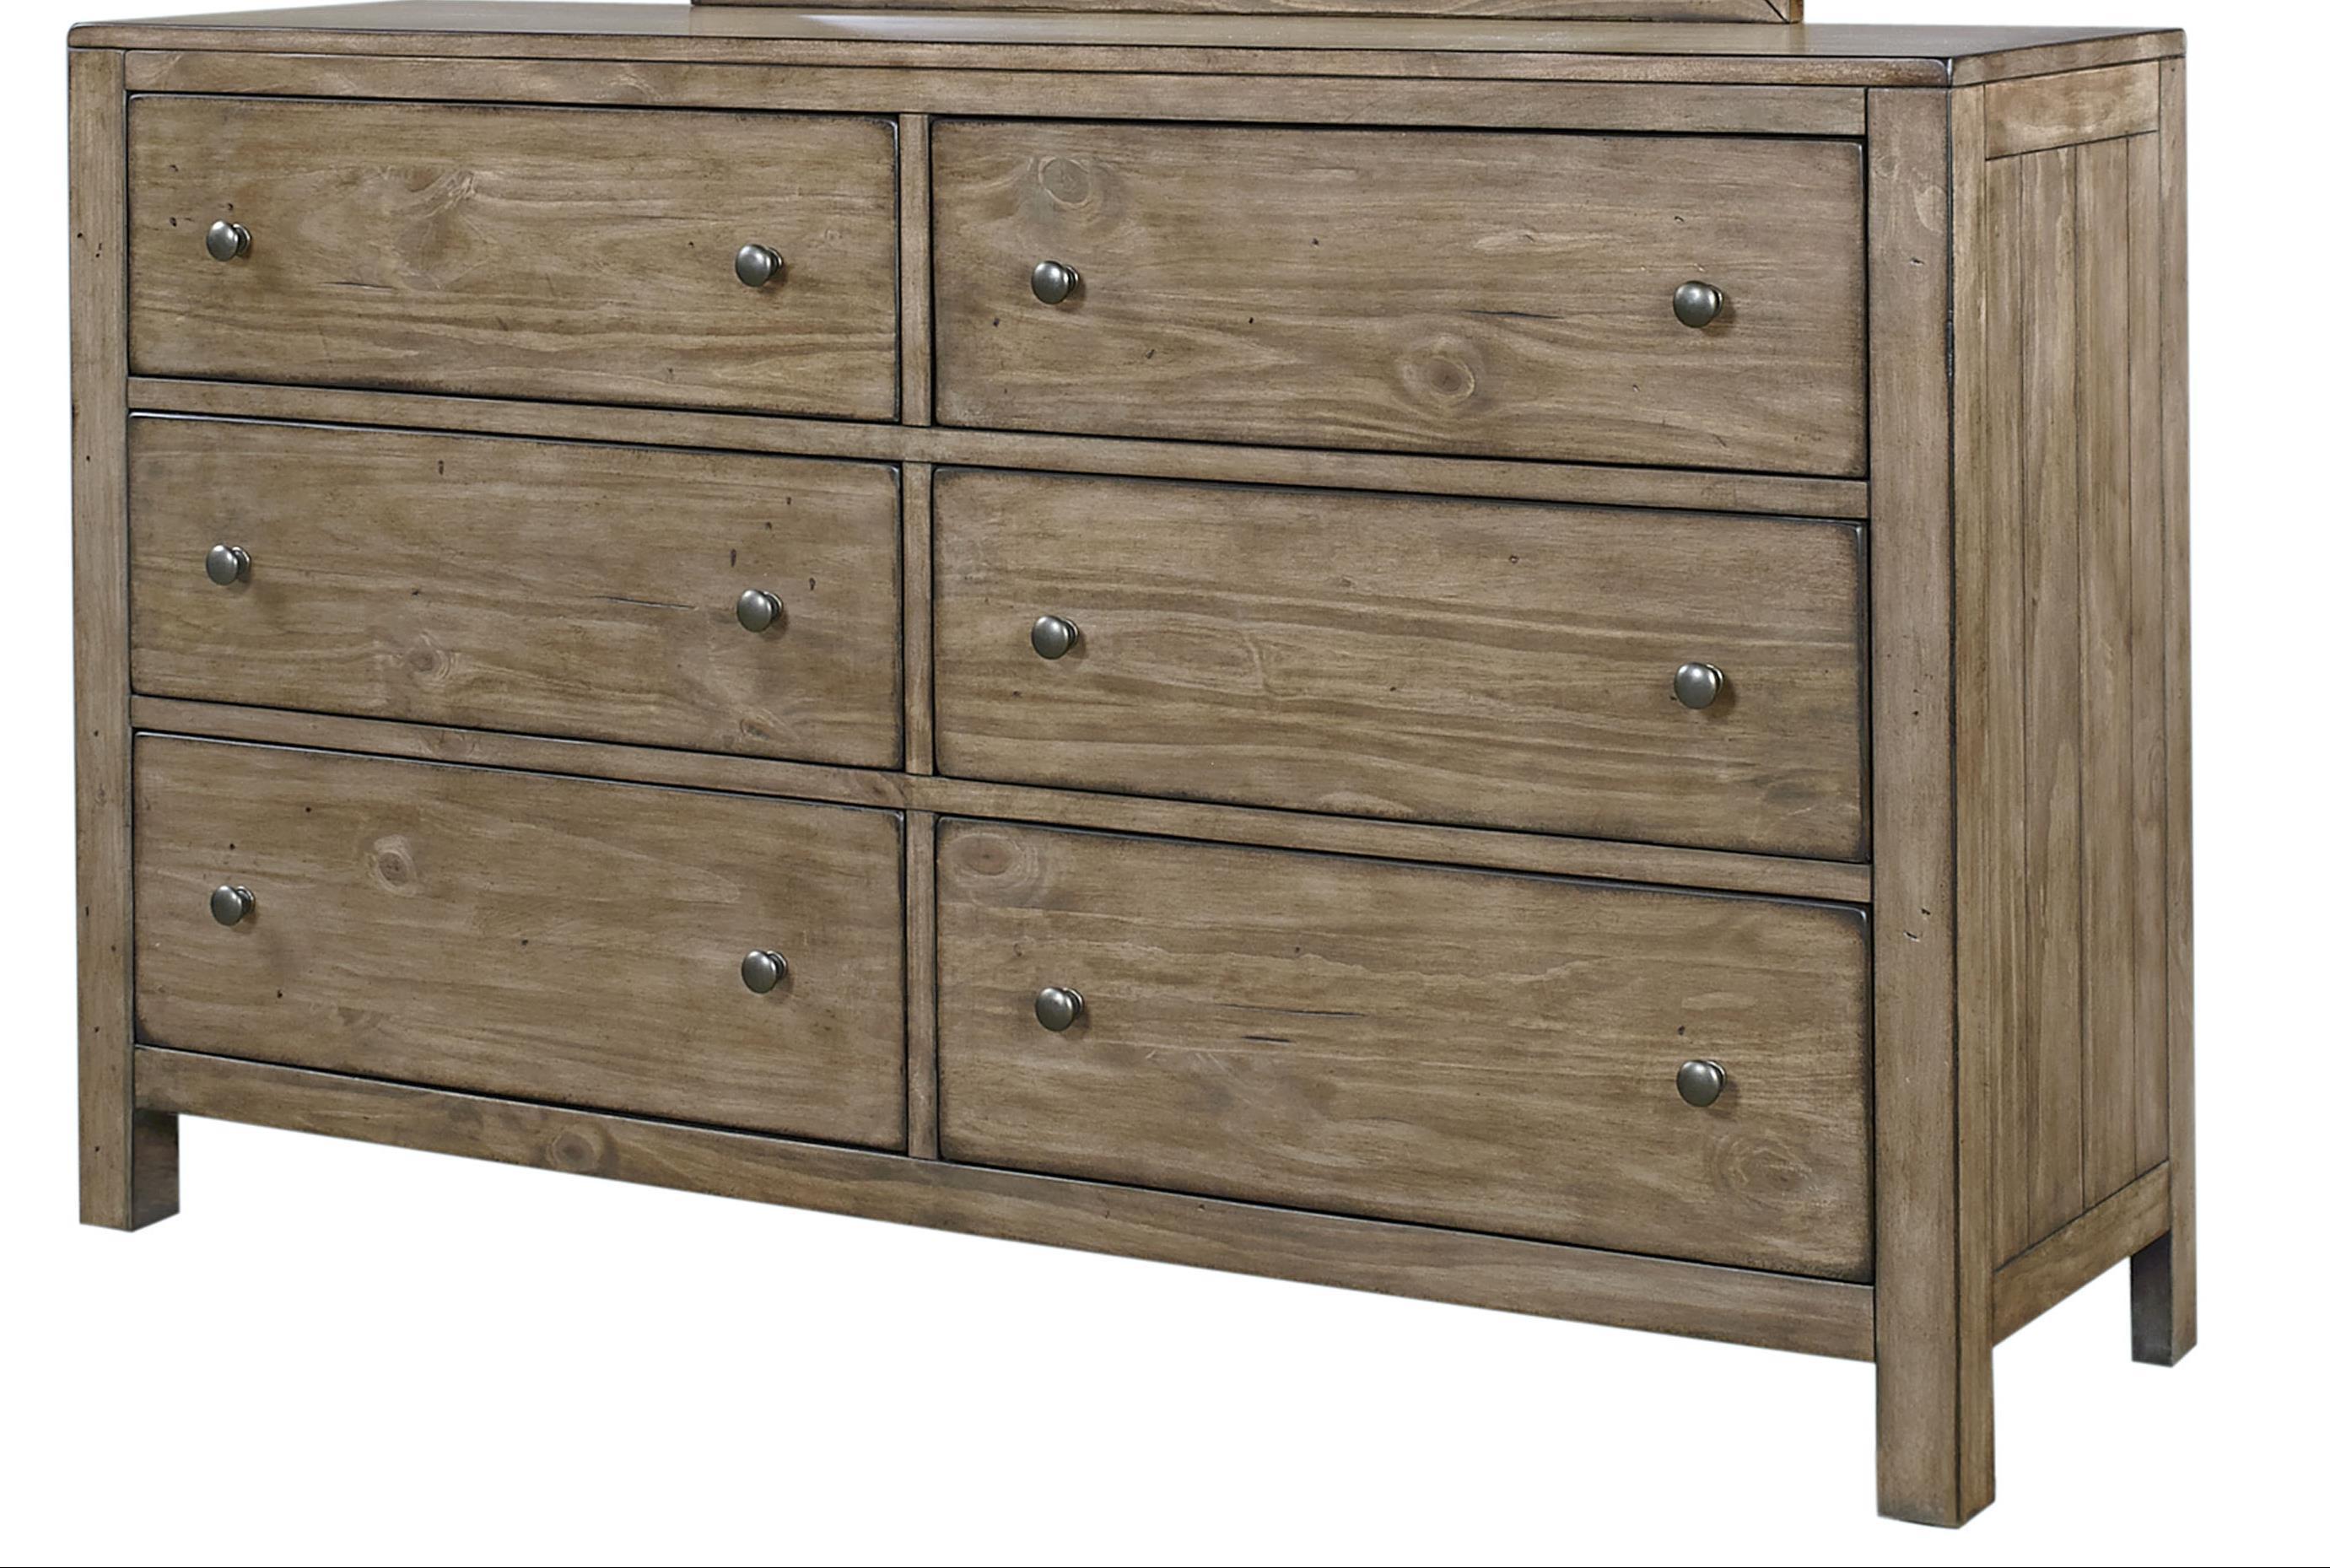 Tildon Six Drawer Dresser by Aspenhome at Walker's Furniture